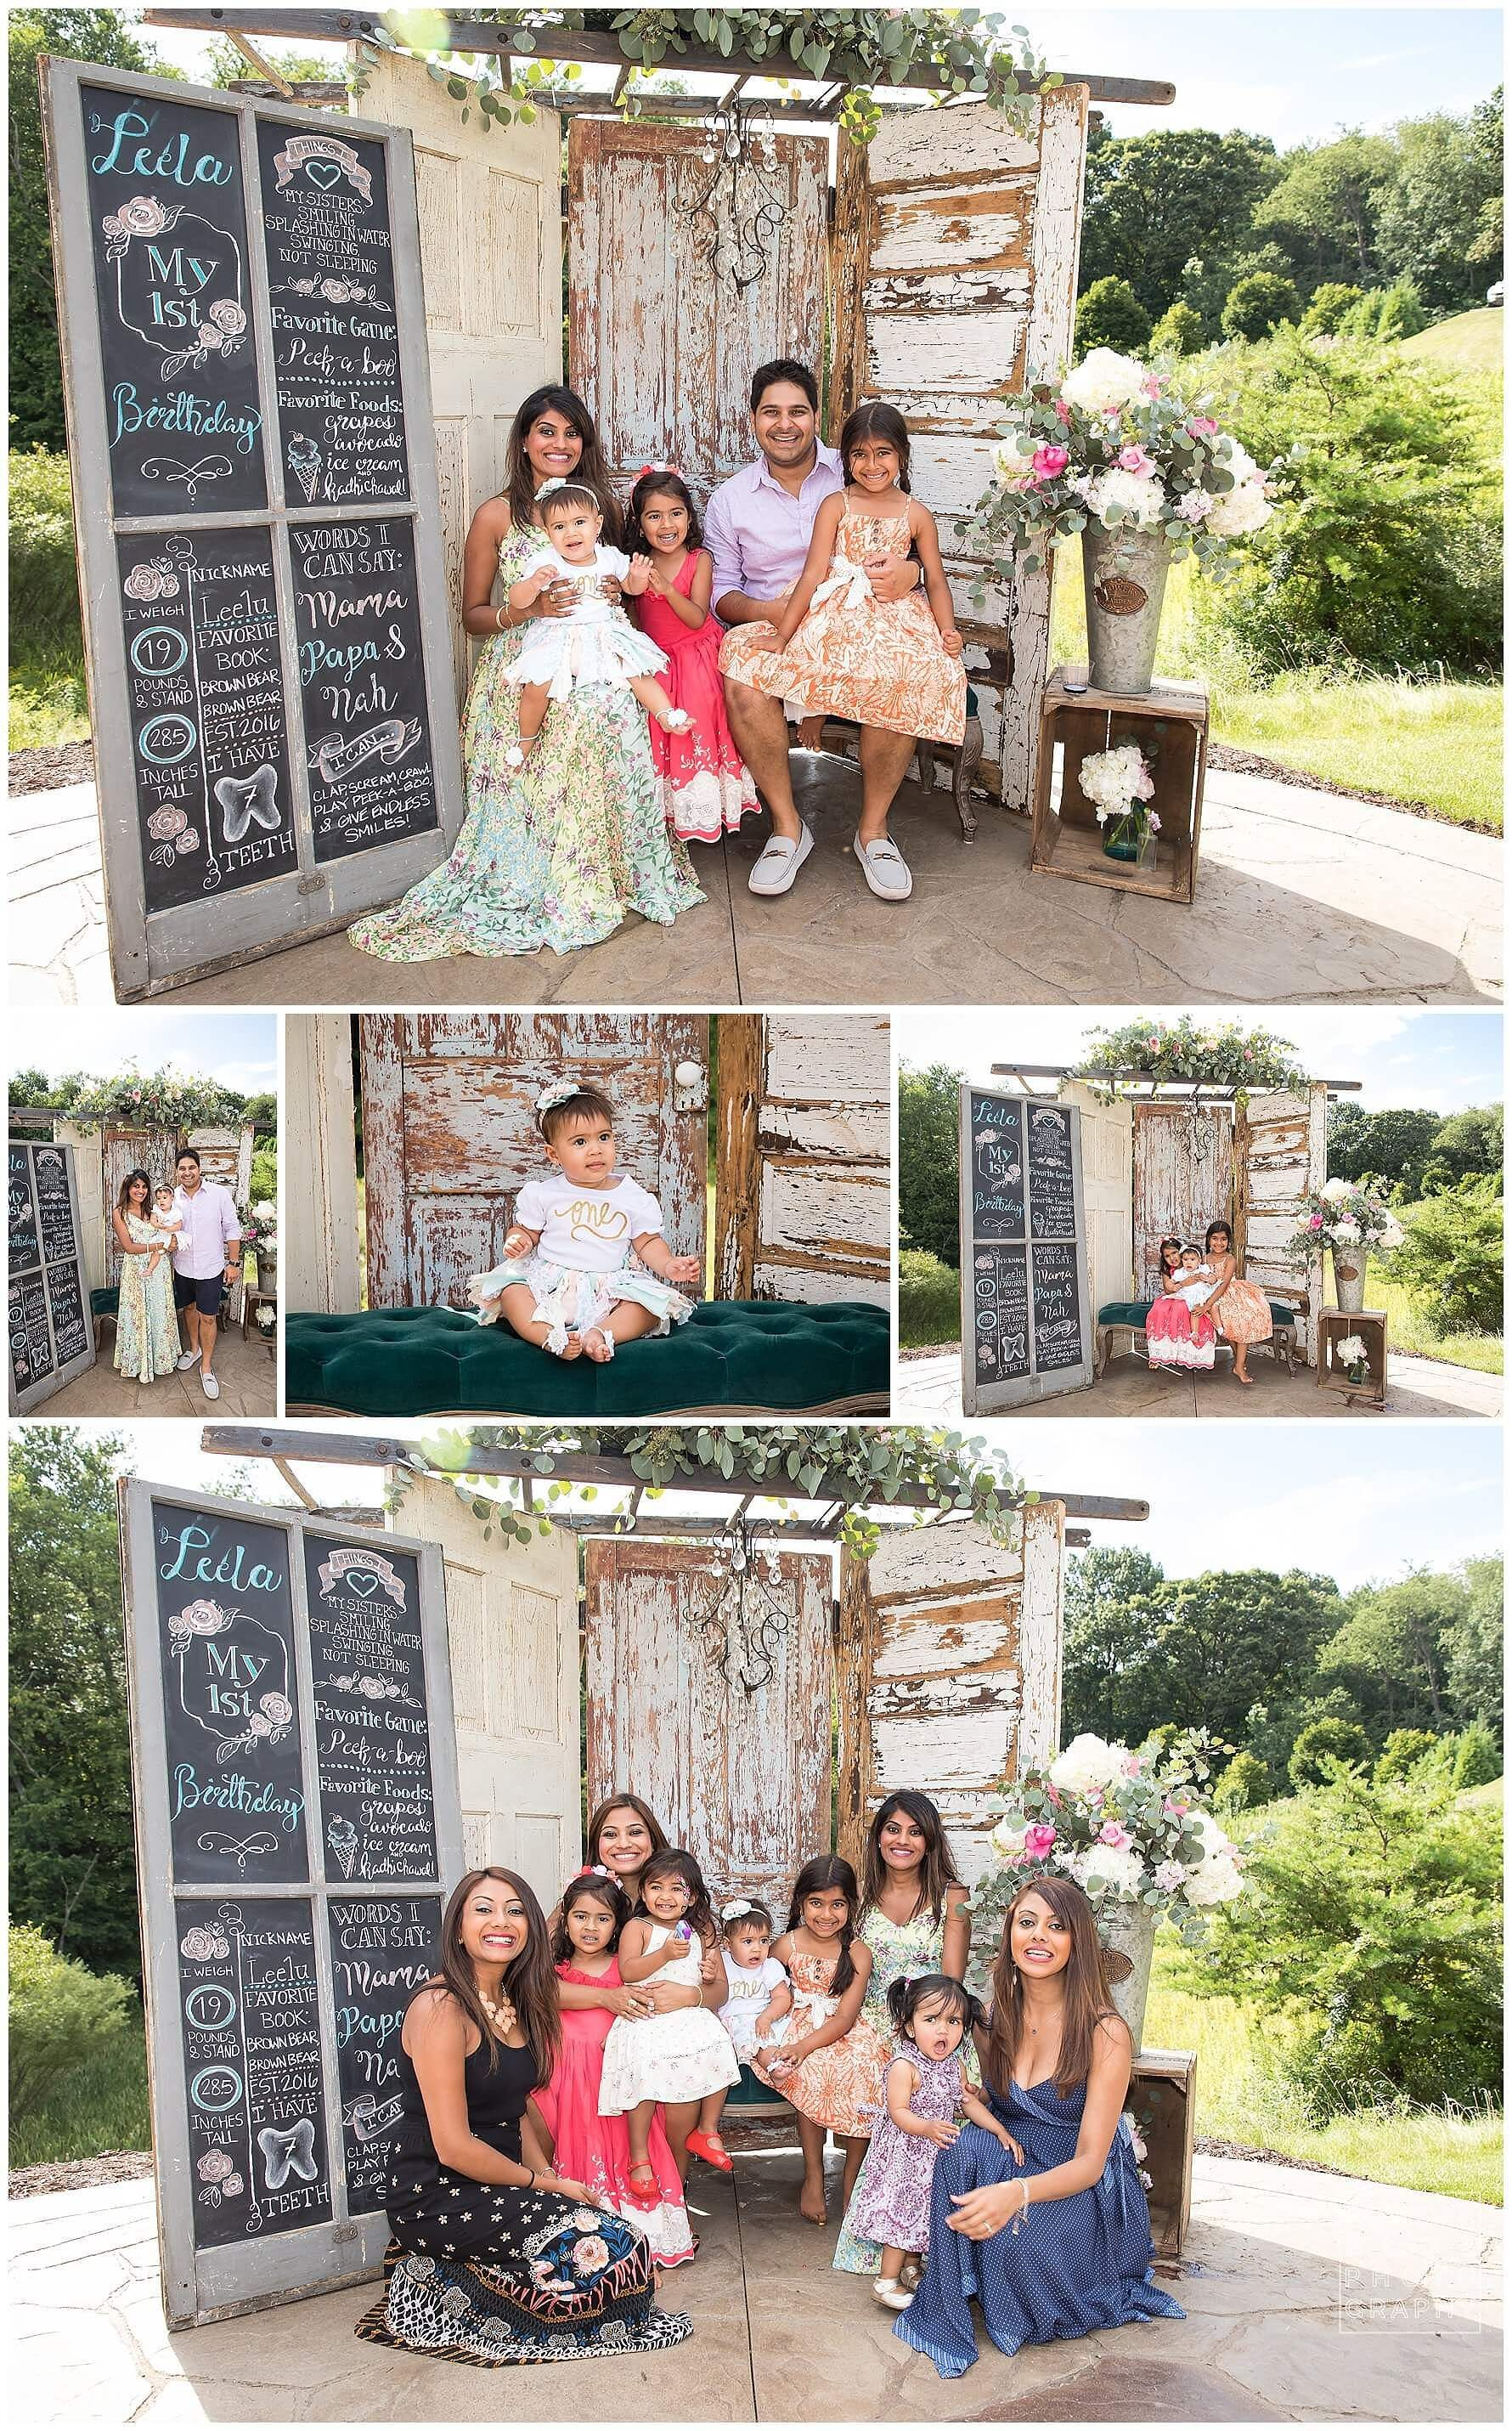 Leela S 1st Birthday Pittsburgh Baby Photographer Shabby Chic Summer Backyard Party Summer Backyard Parties Backyard Party Photographing Babies